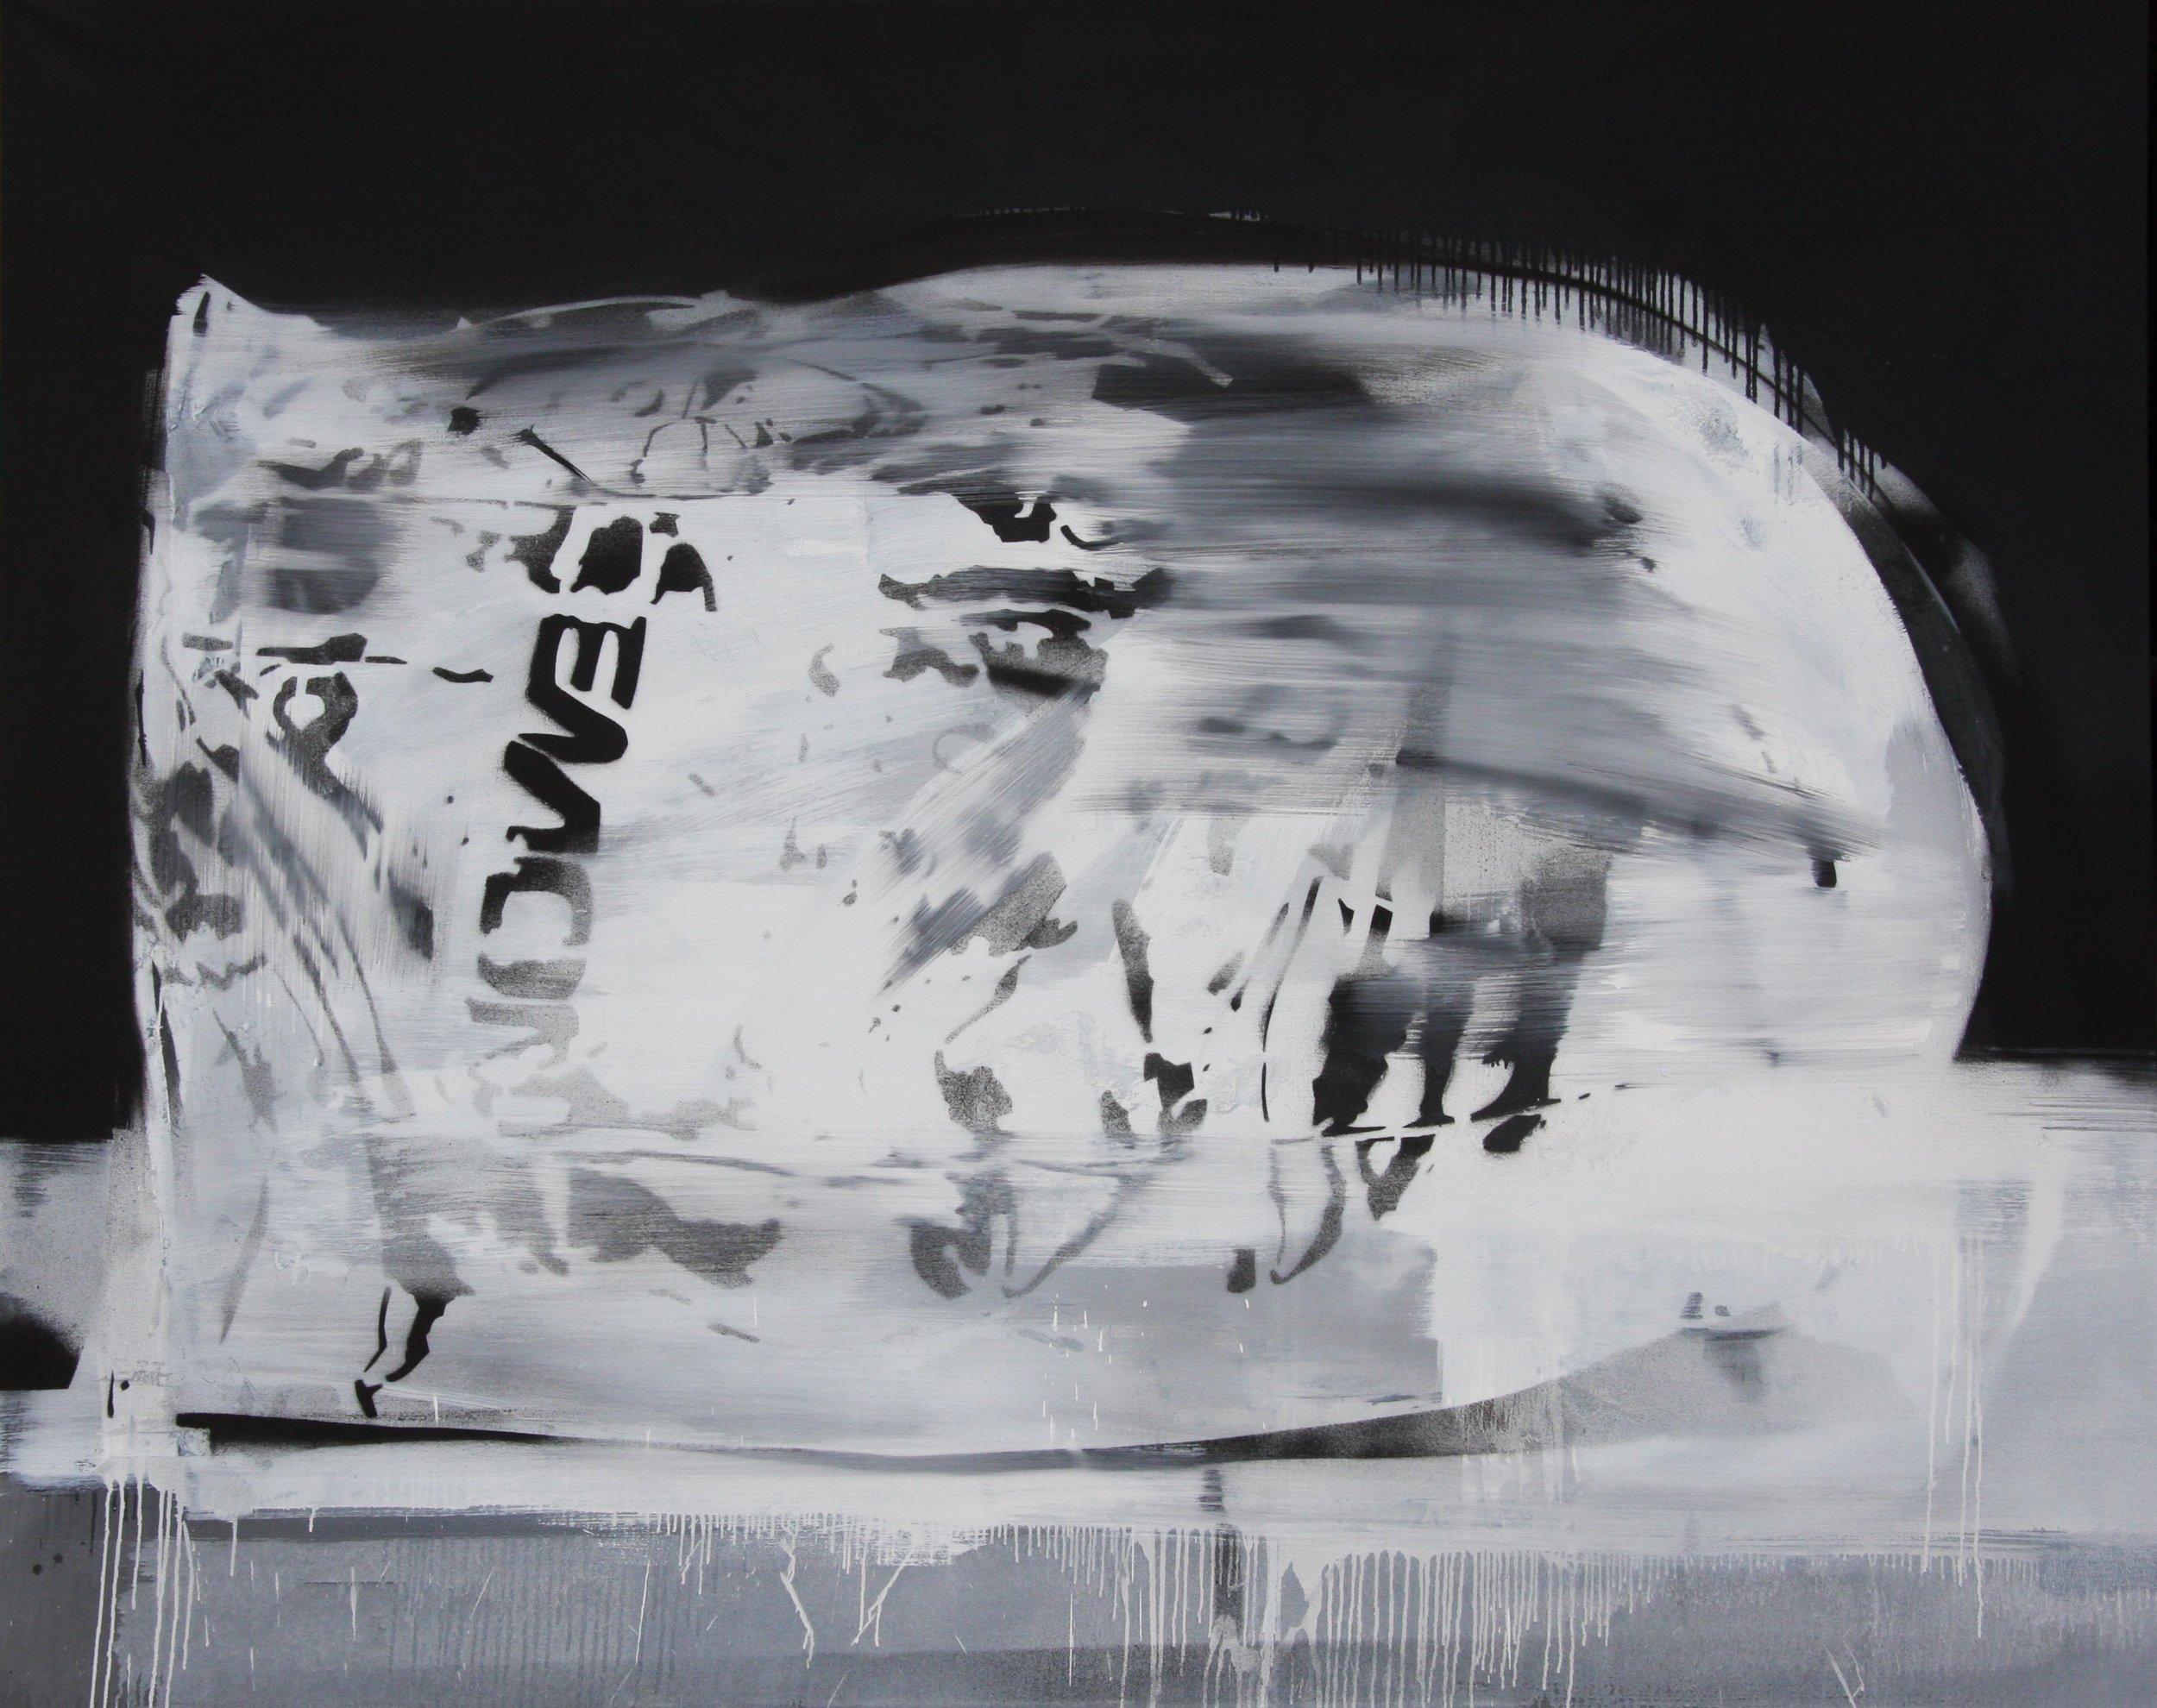 Kopie von Kopf 1120002 Öl-Leinwand 150 x 200 cm